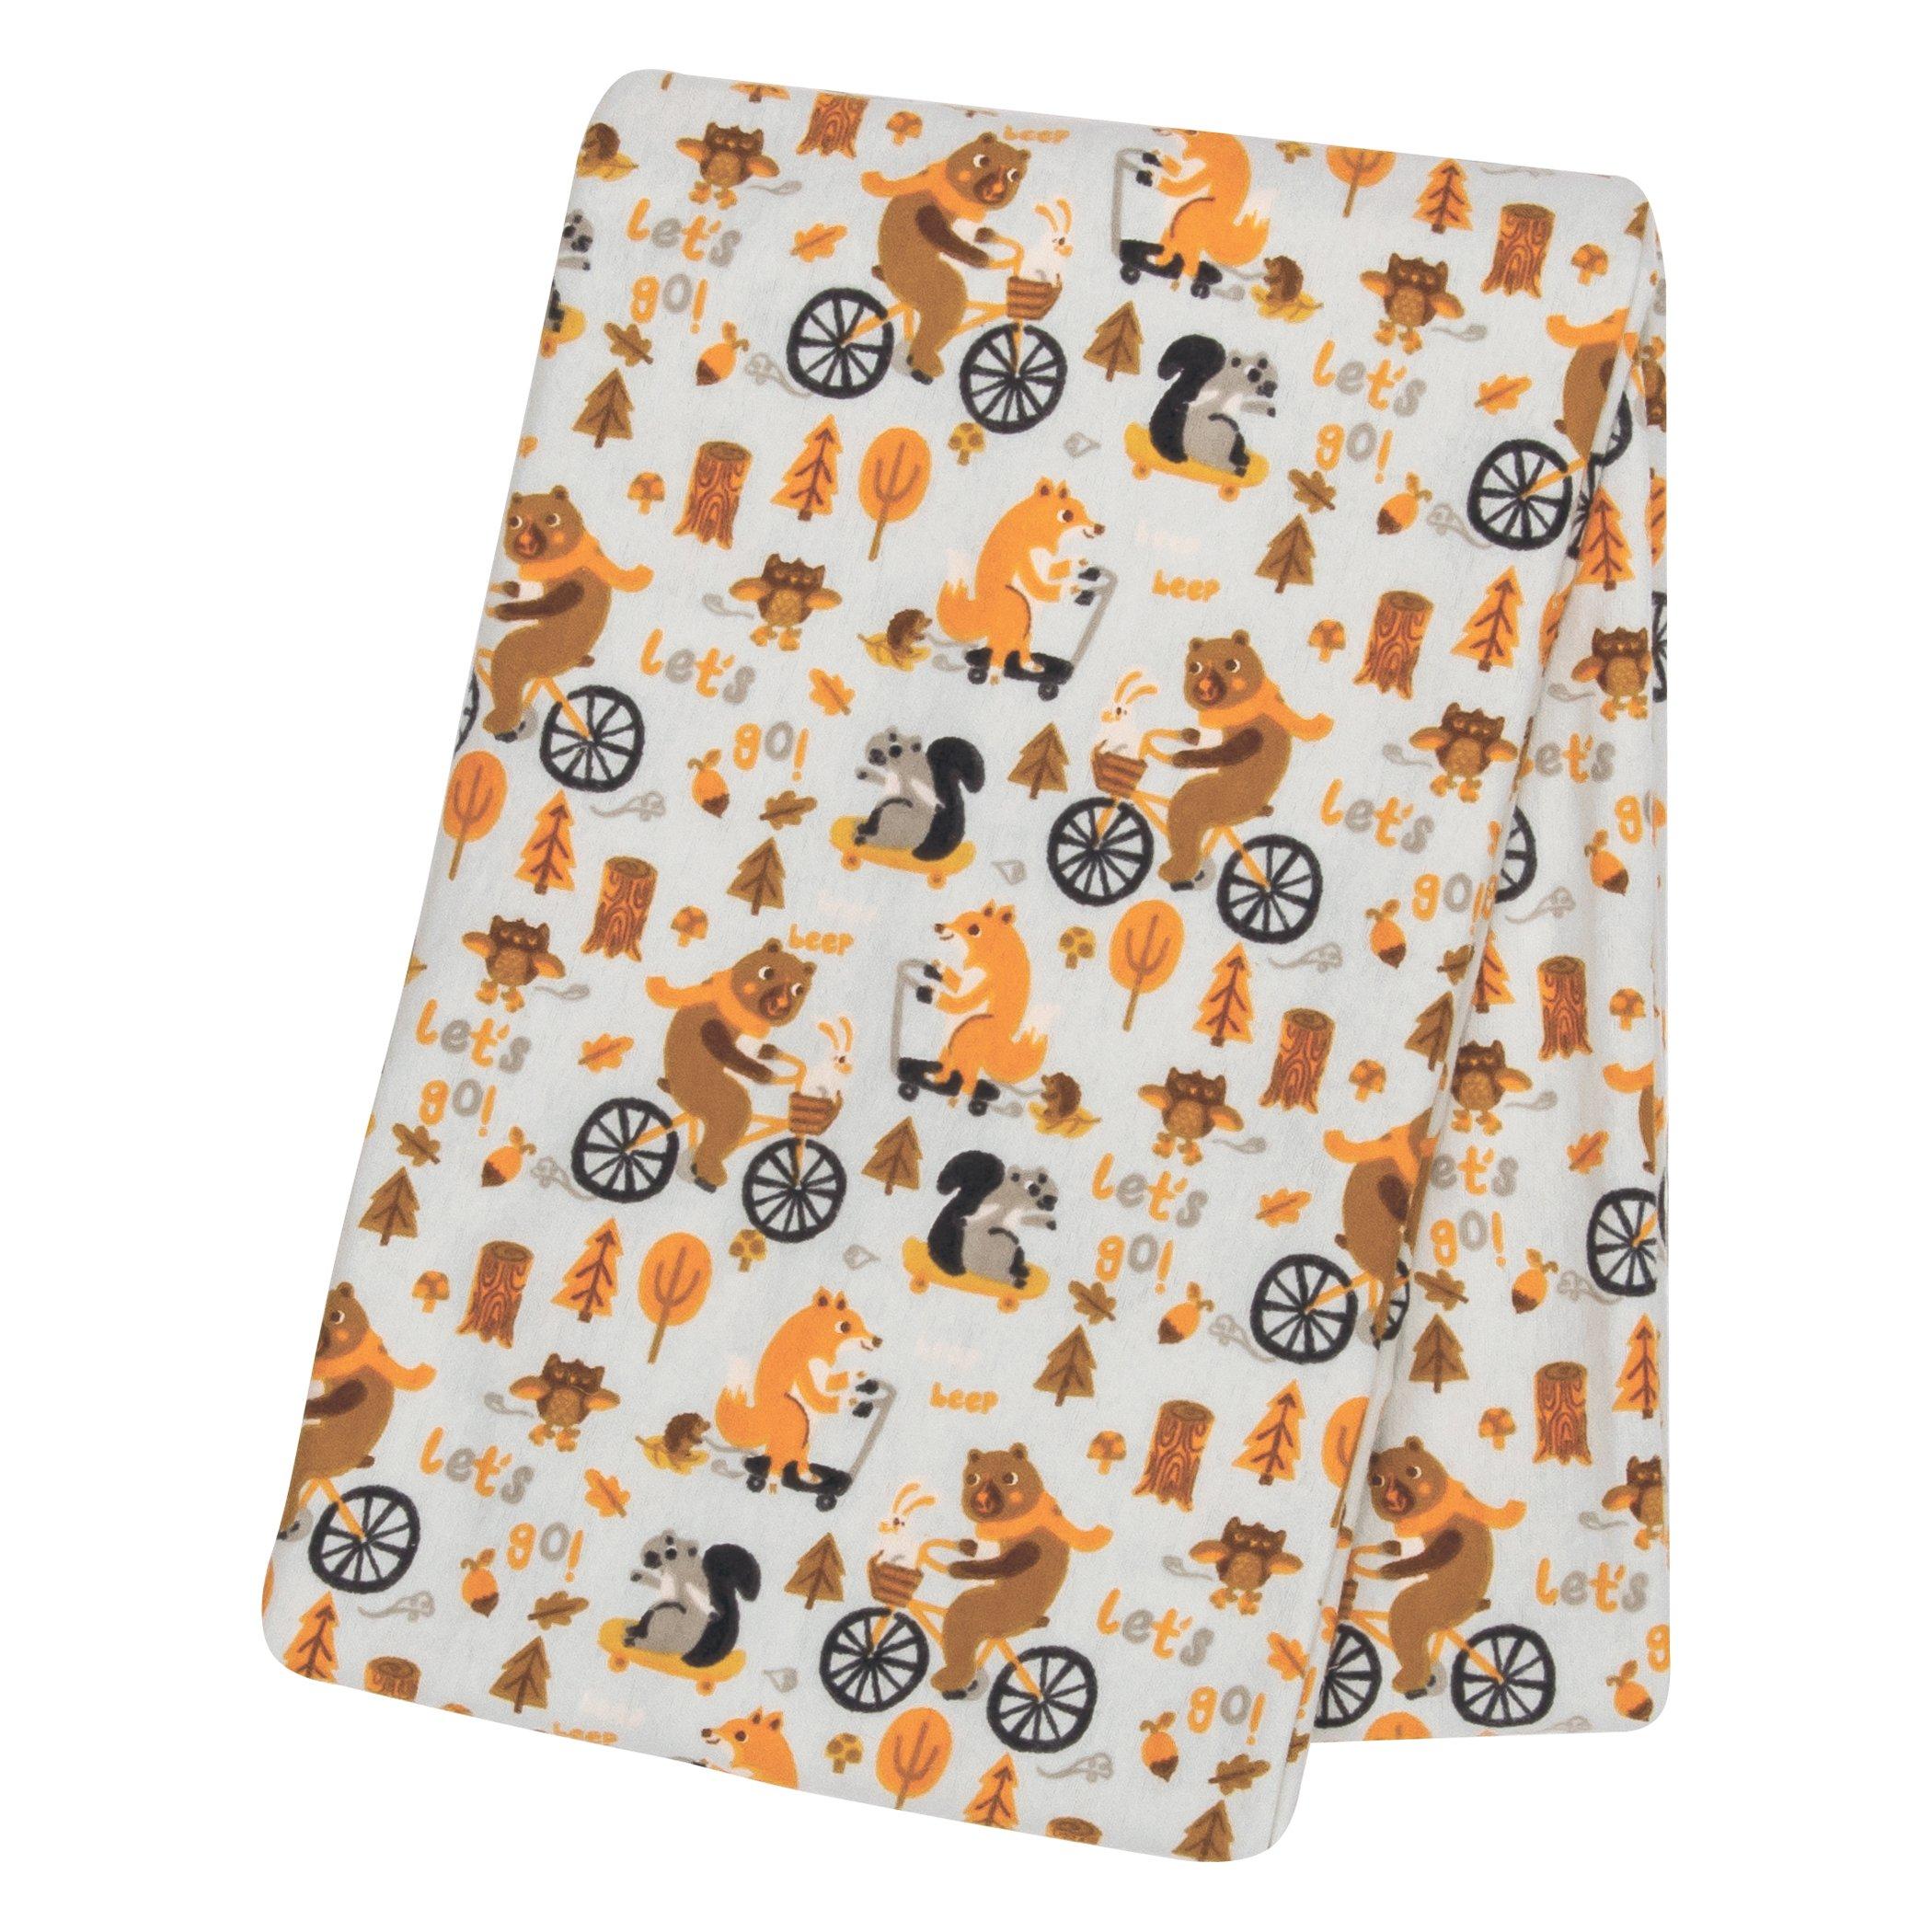 Flannel Baby Blanket Patterns Free Patterns